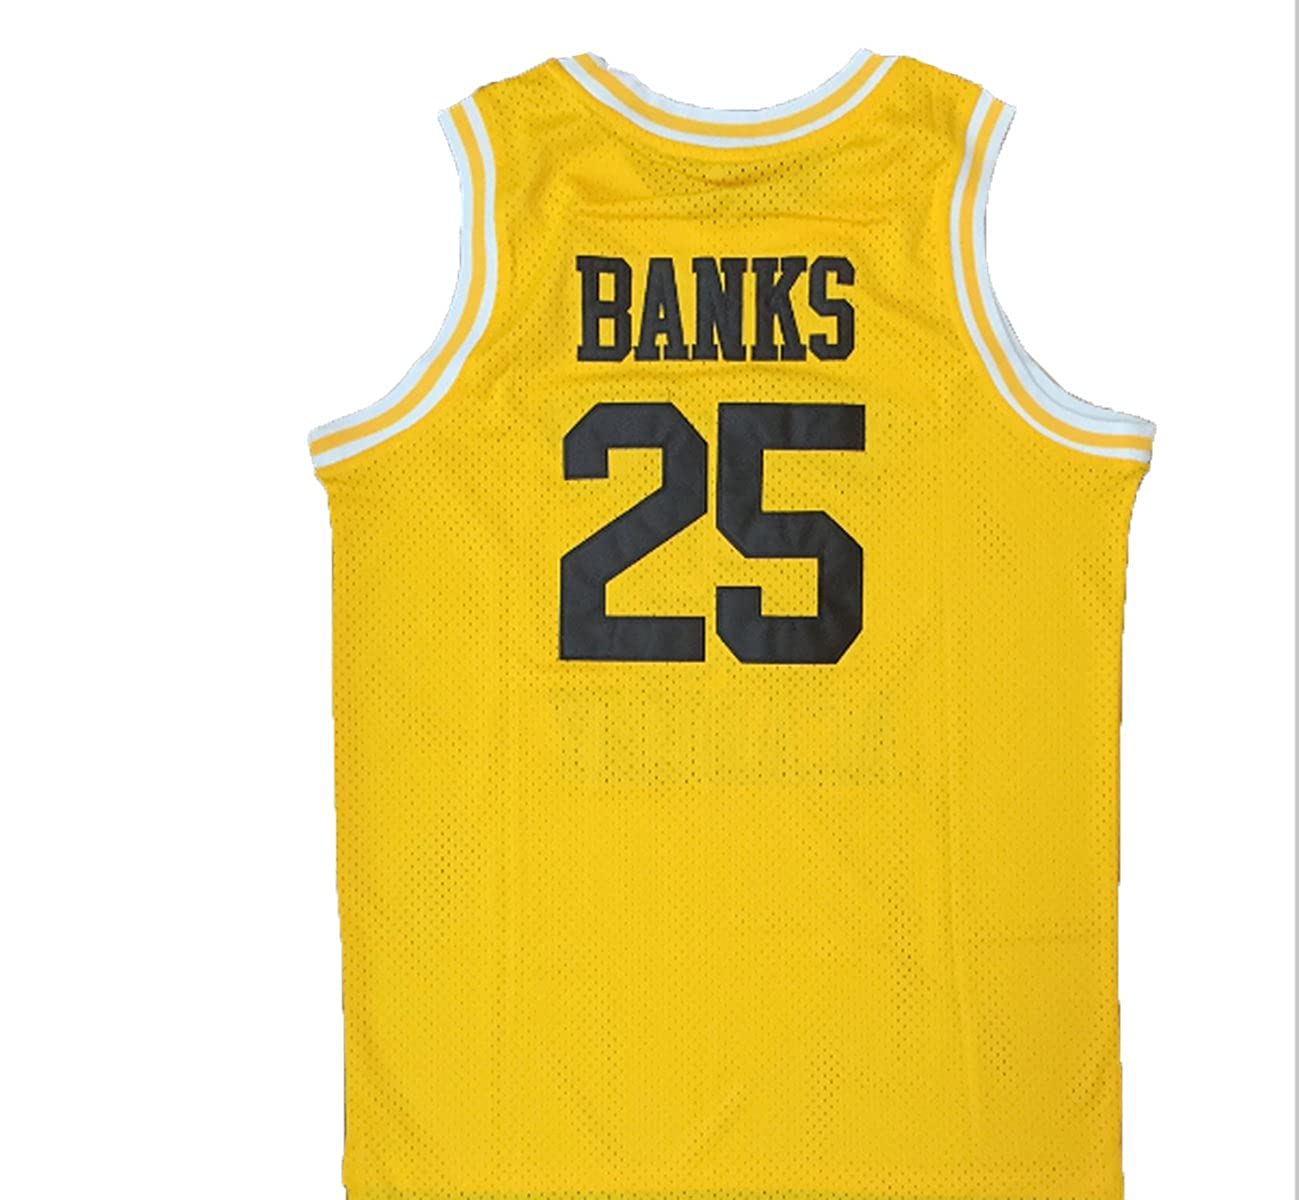 27f972c3ea9 Amazon.com  MyPartyShirt Carlton Banks  25 Yellow Basketball Jersey Fresh  Prince of Bel Air Academy Gift  Clothing